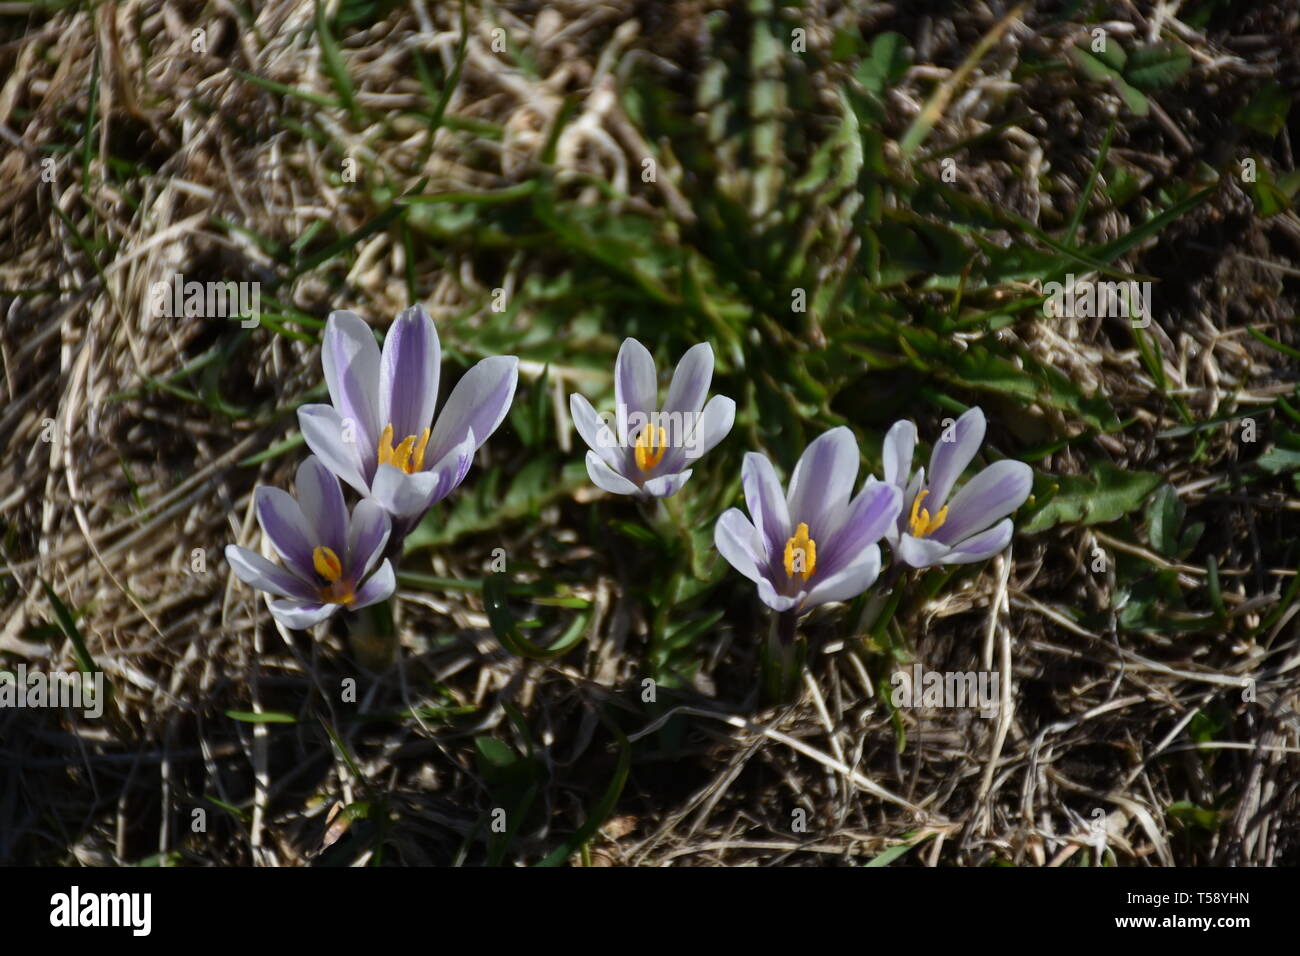 Krokus, Krokusse, Blume, Blumen, Blüte, Blüten, Frühling, Frühlingsblume, Wiese, Weide, genügsam, Wiesenblume, Crocus, Schwertlilie, Schwertliliengewä - Stock Image